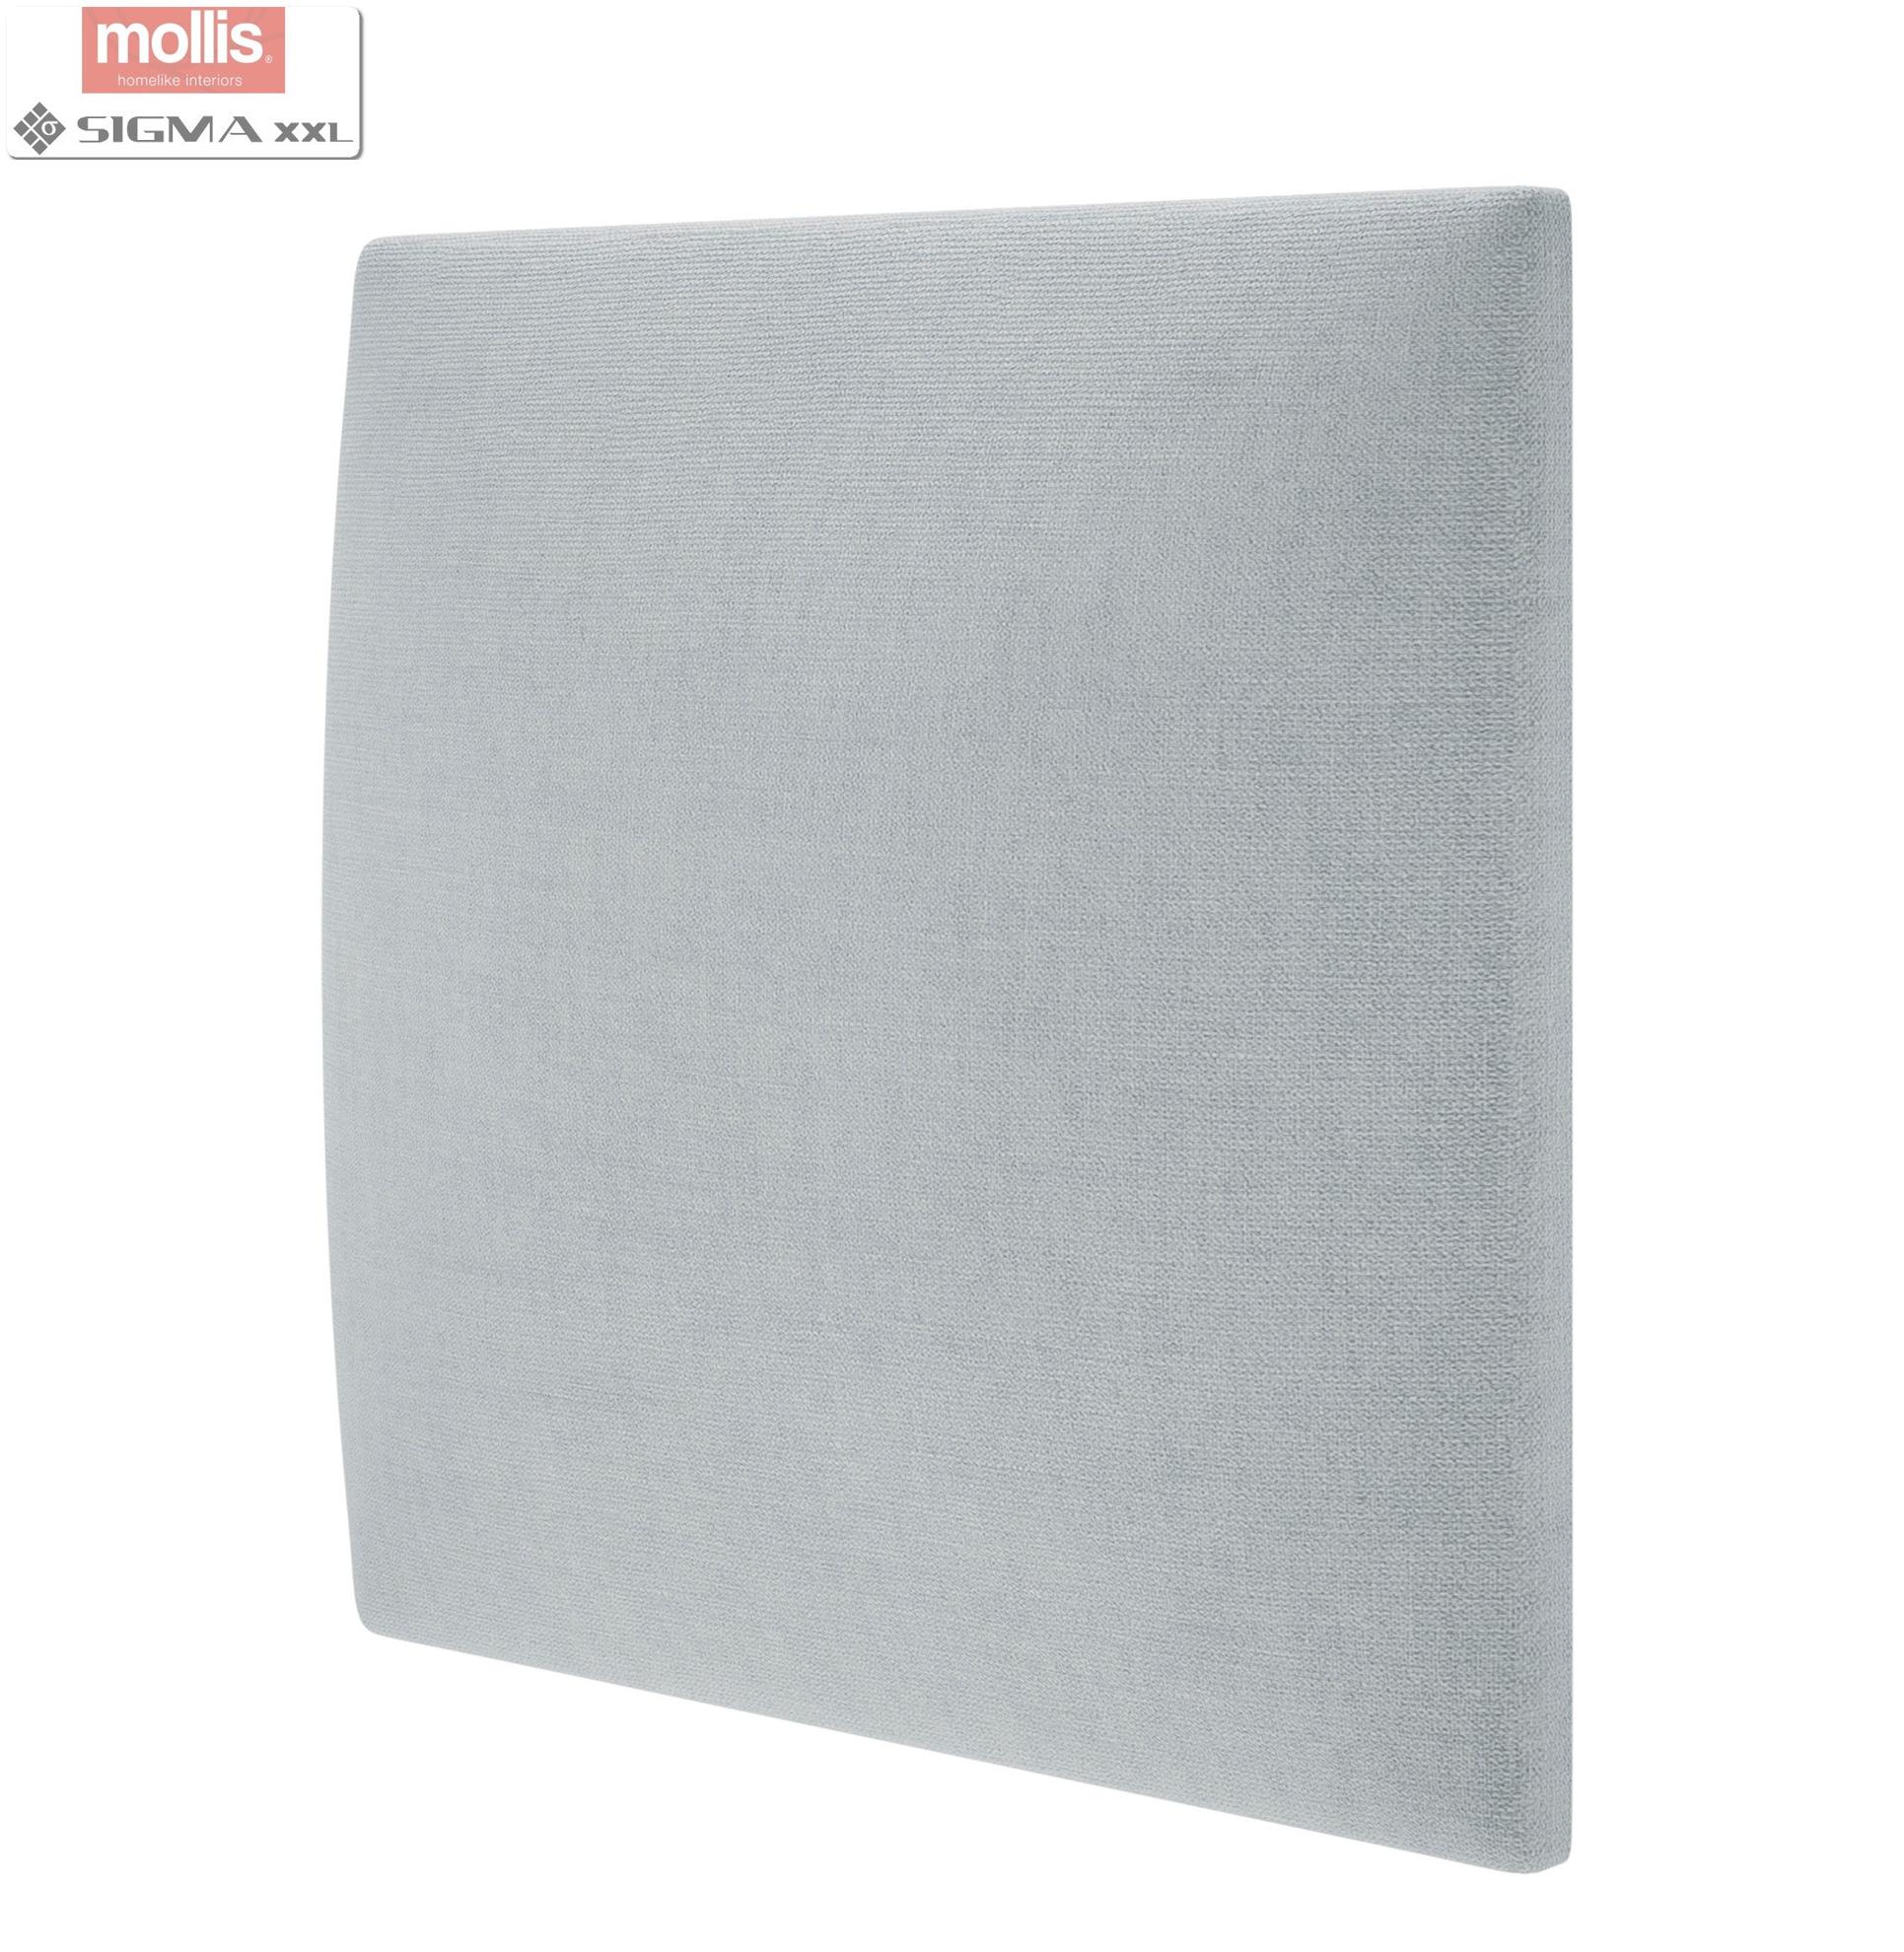 Imagine Mollis Basic 01 Silver (Patrat - 30x30 cm)